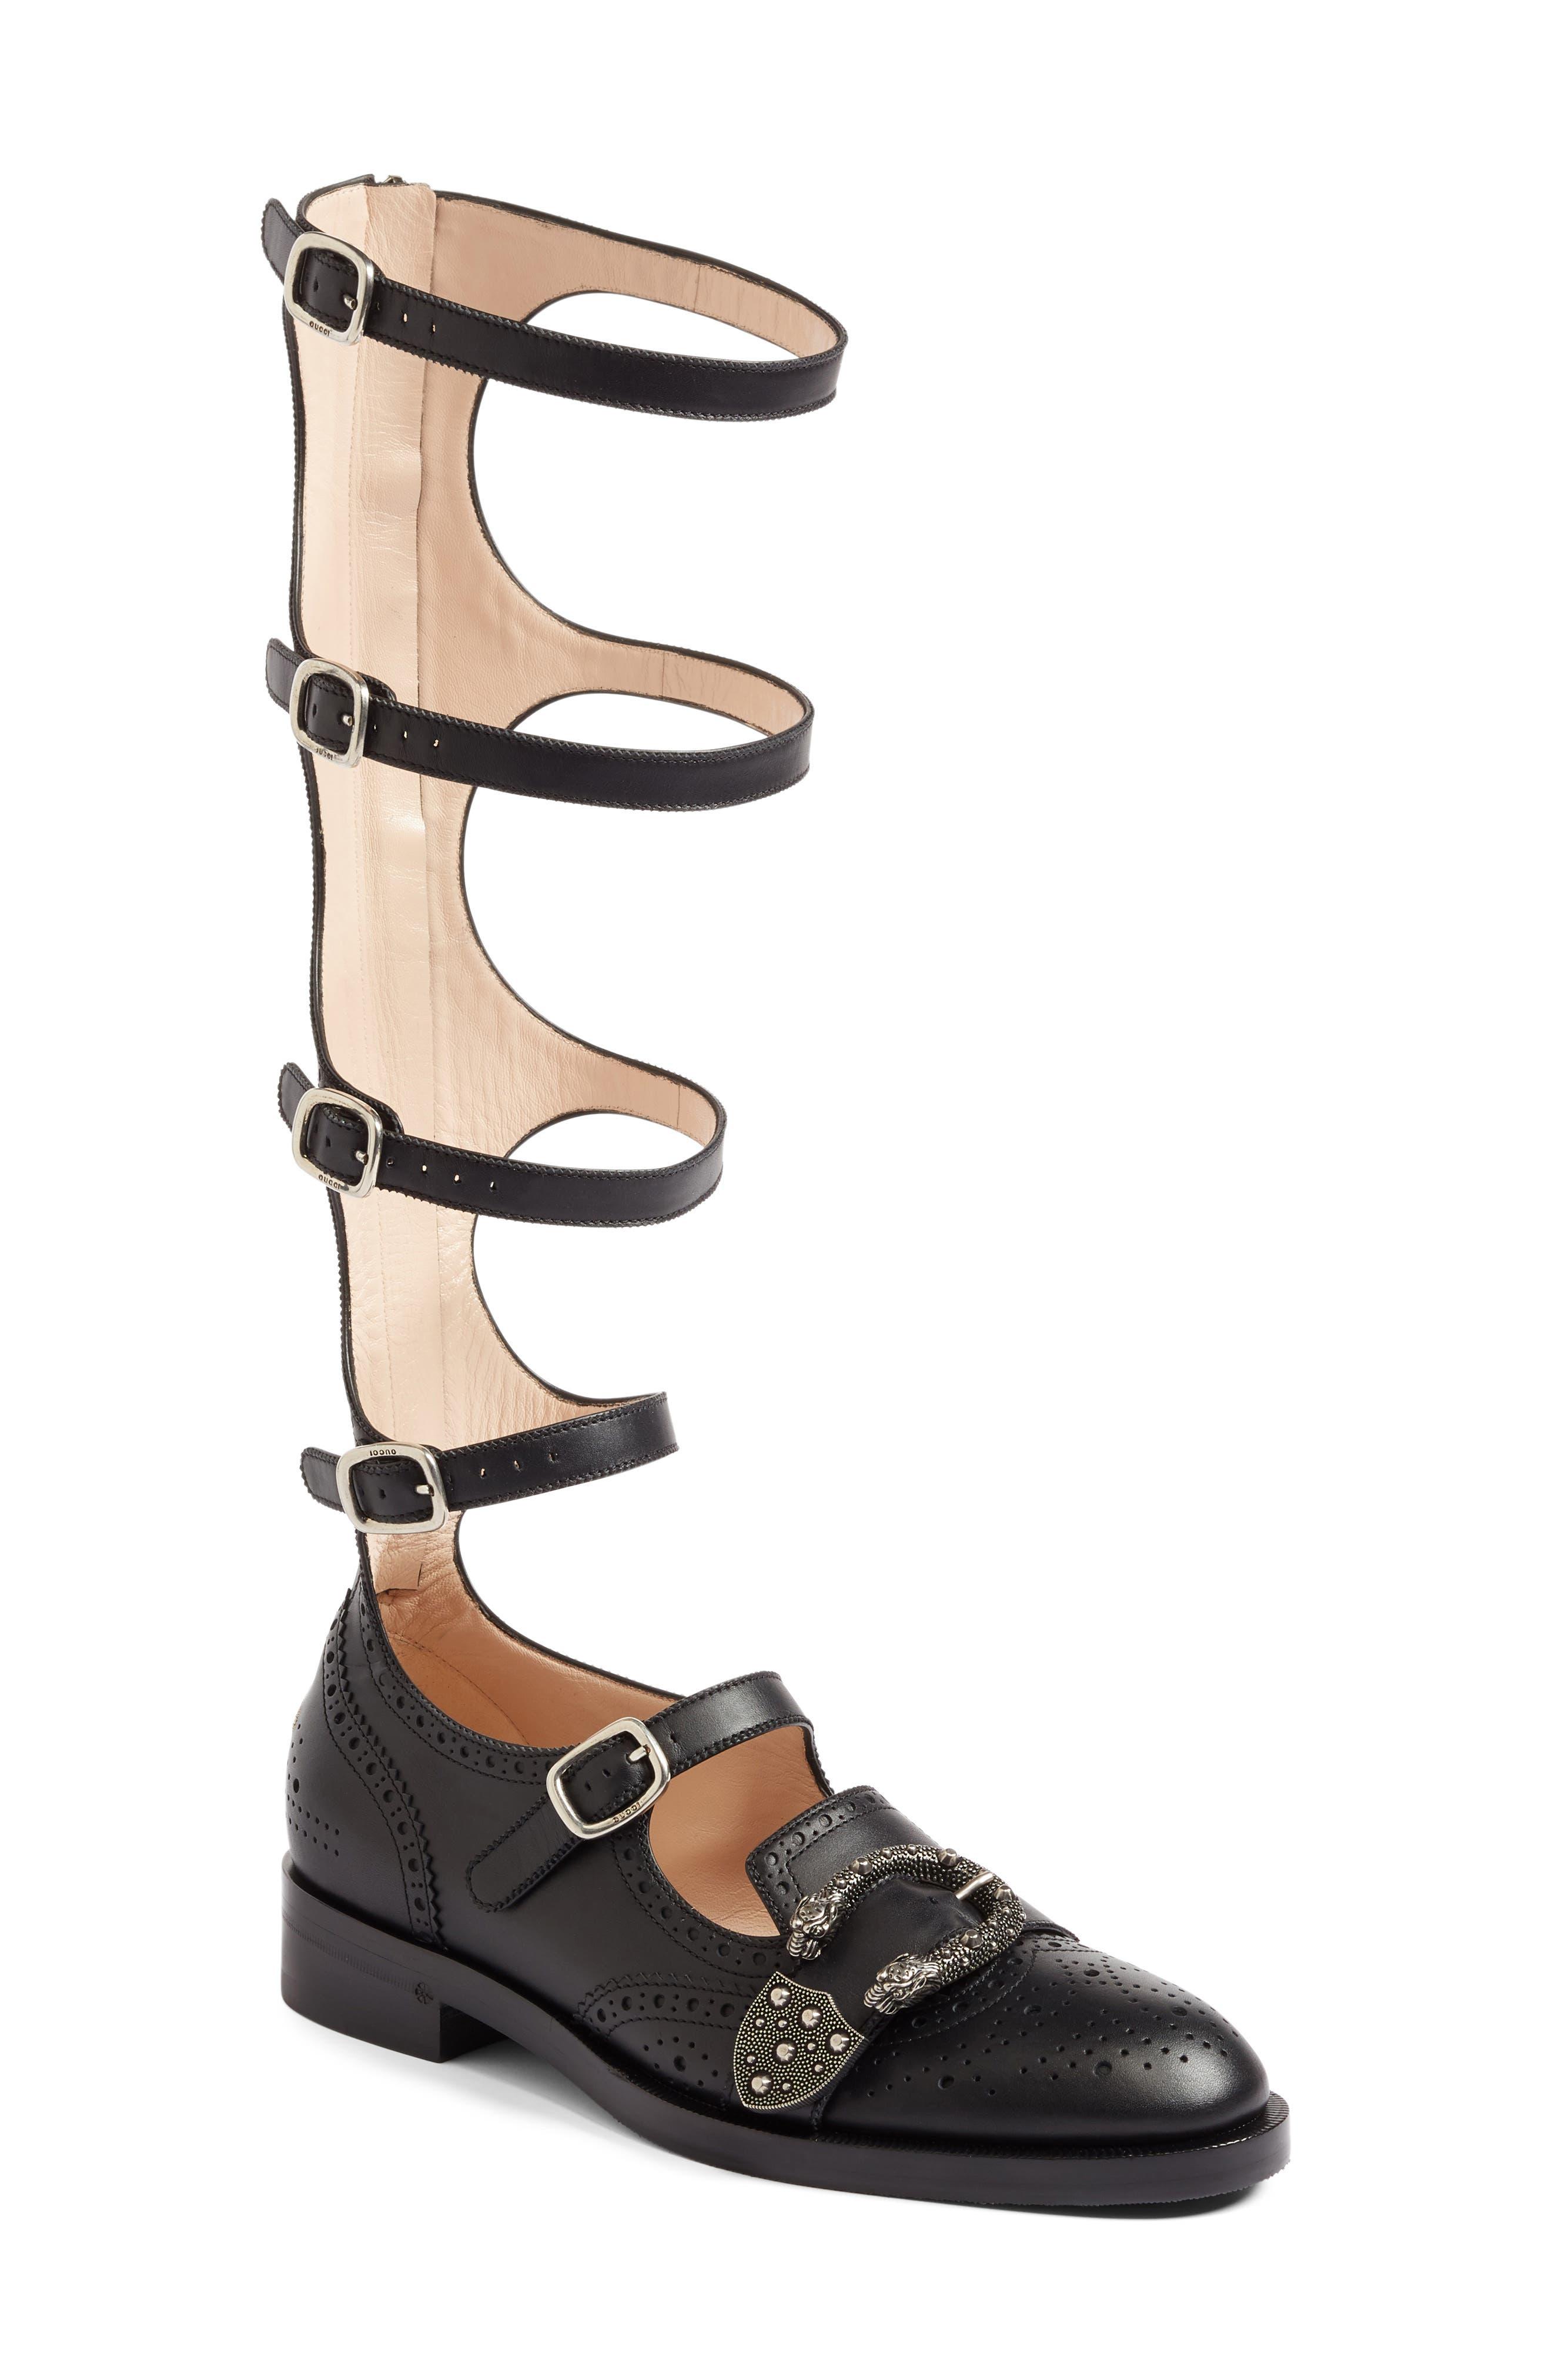 GUCCI Gladiator Loafer, Main, color, 001